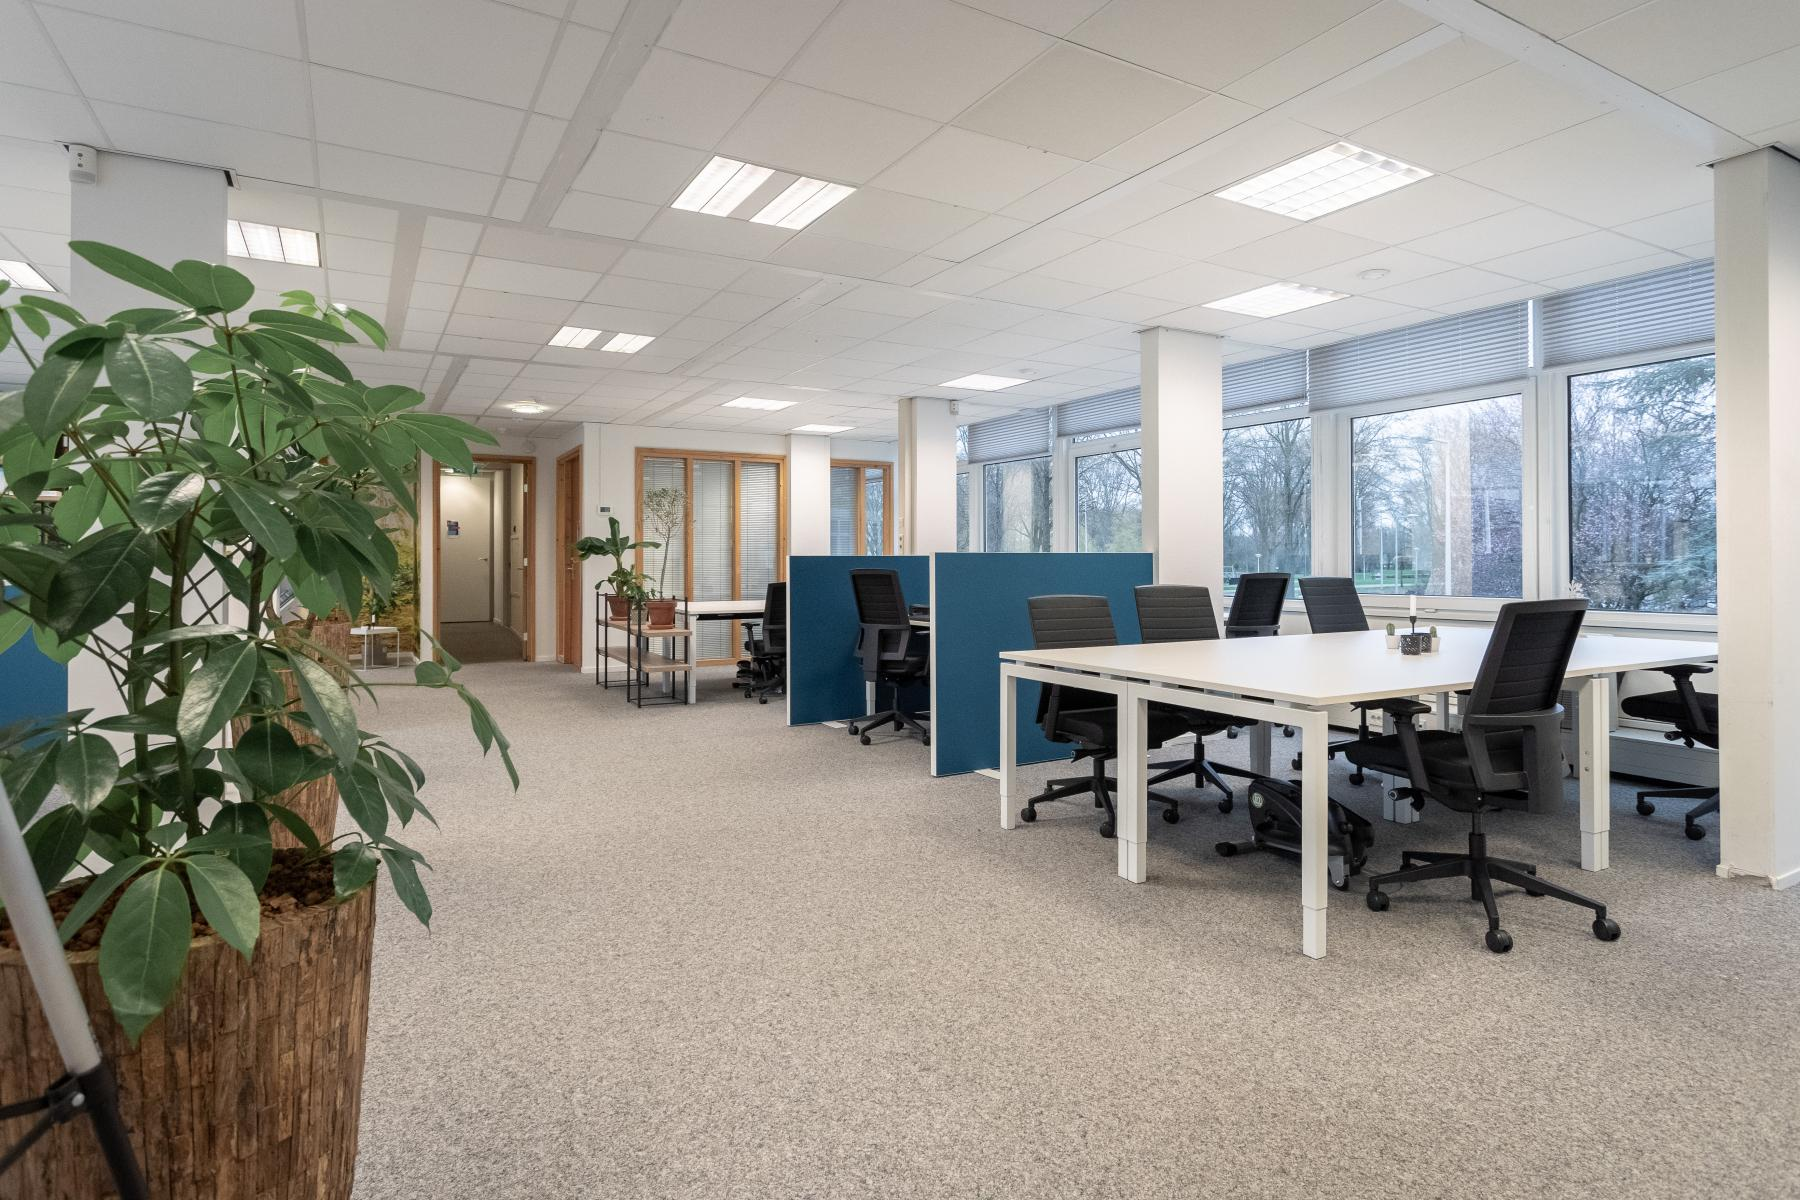 Baden powellweg 305b officeplanner 13